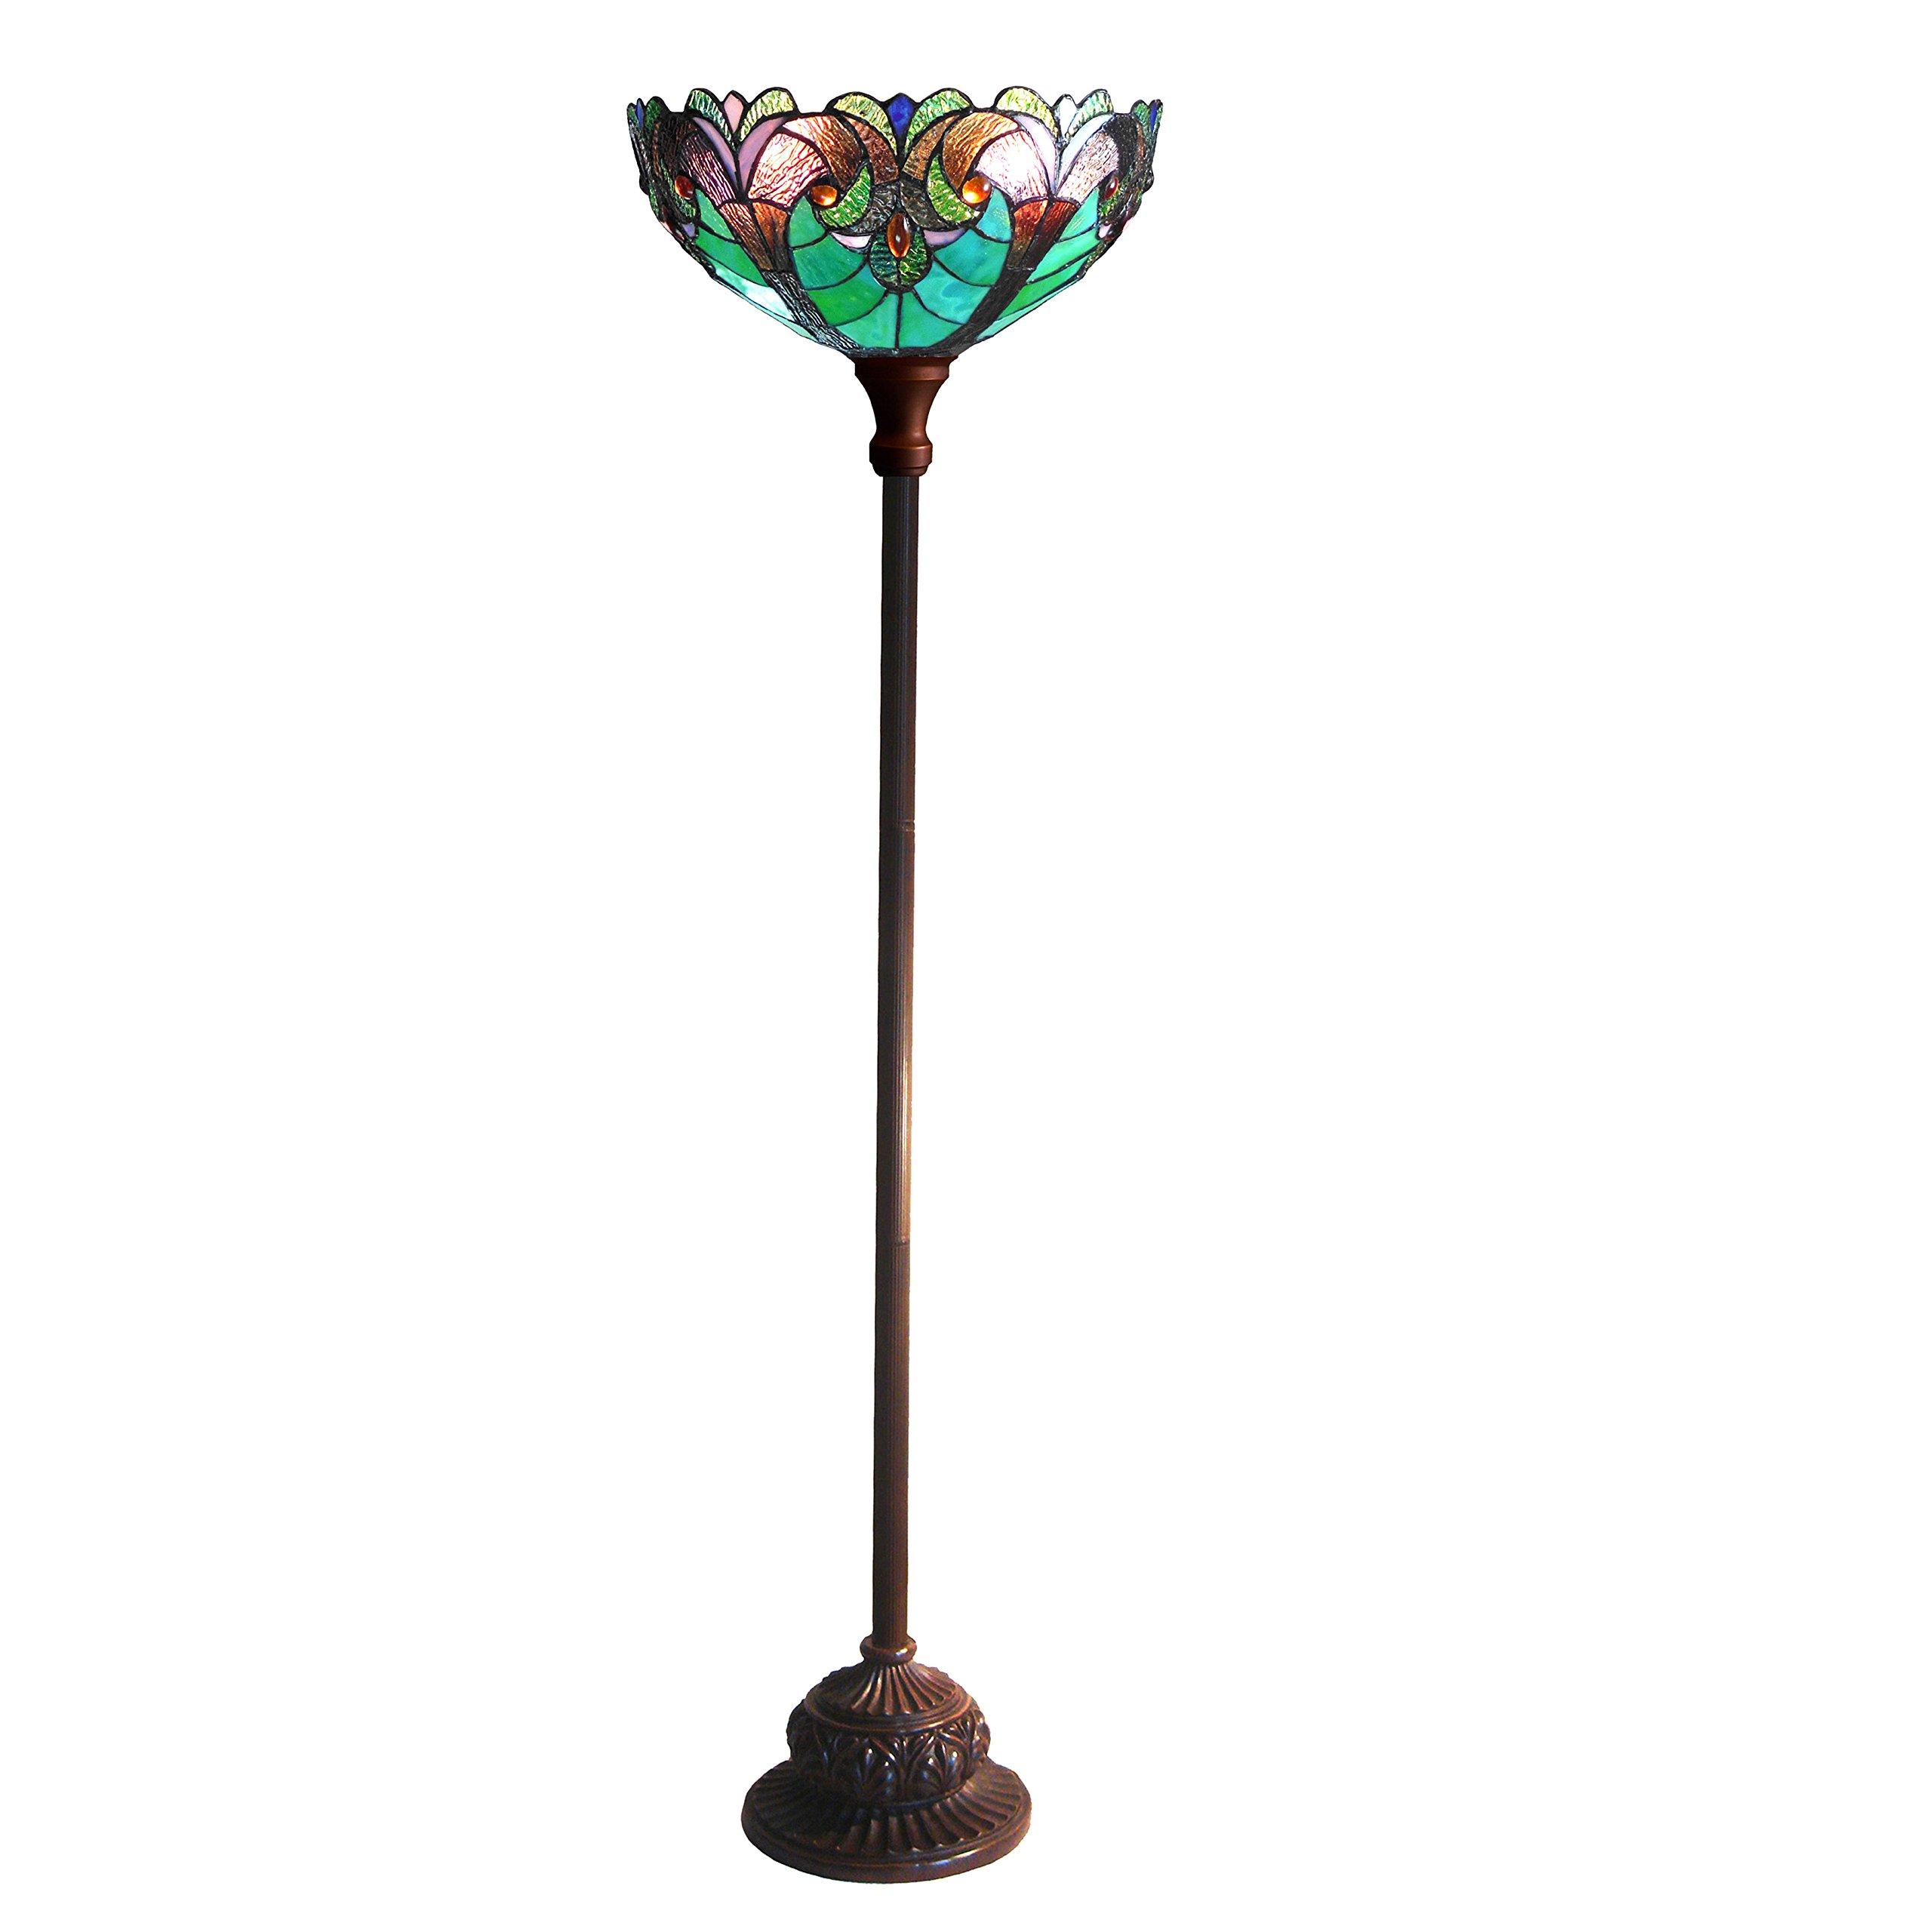 Chloe Lighting CH18780VG15-TF1 1 Light 15'' Shade Liaison Tiffany-Style Victorian Torchiere Floor Lamp